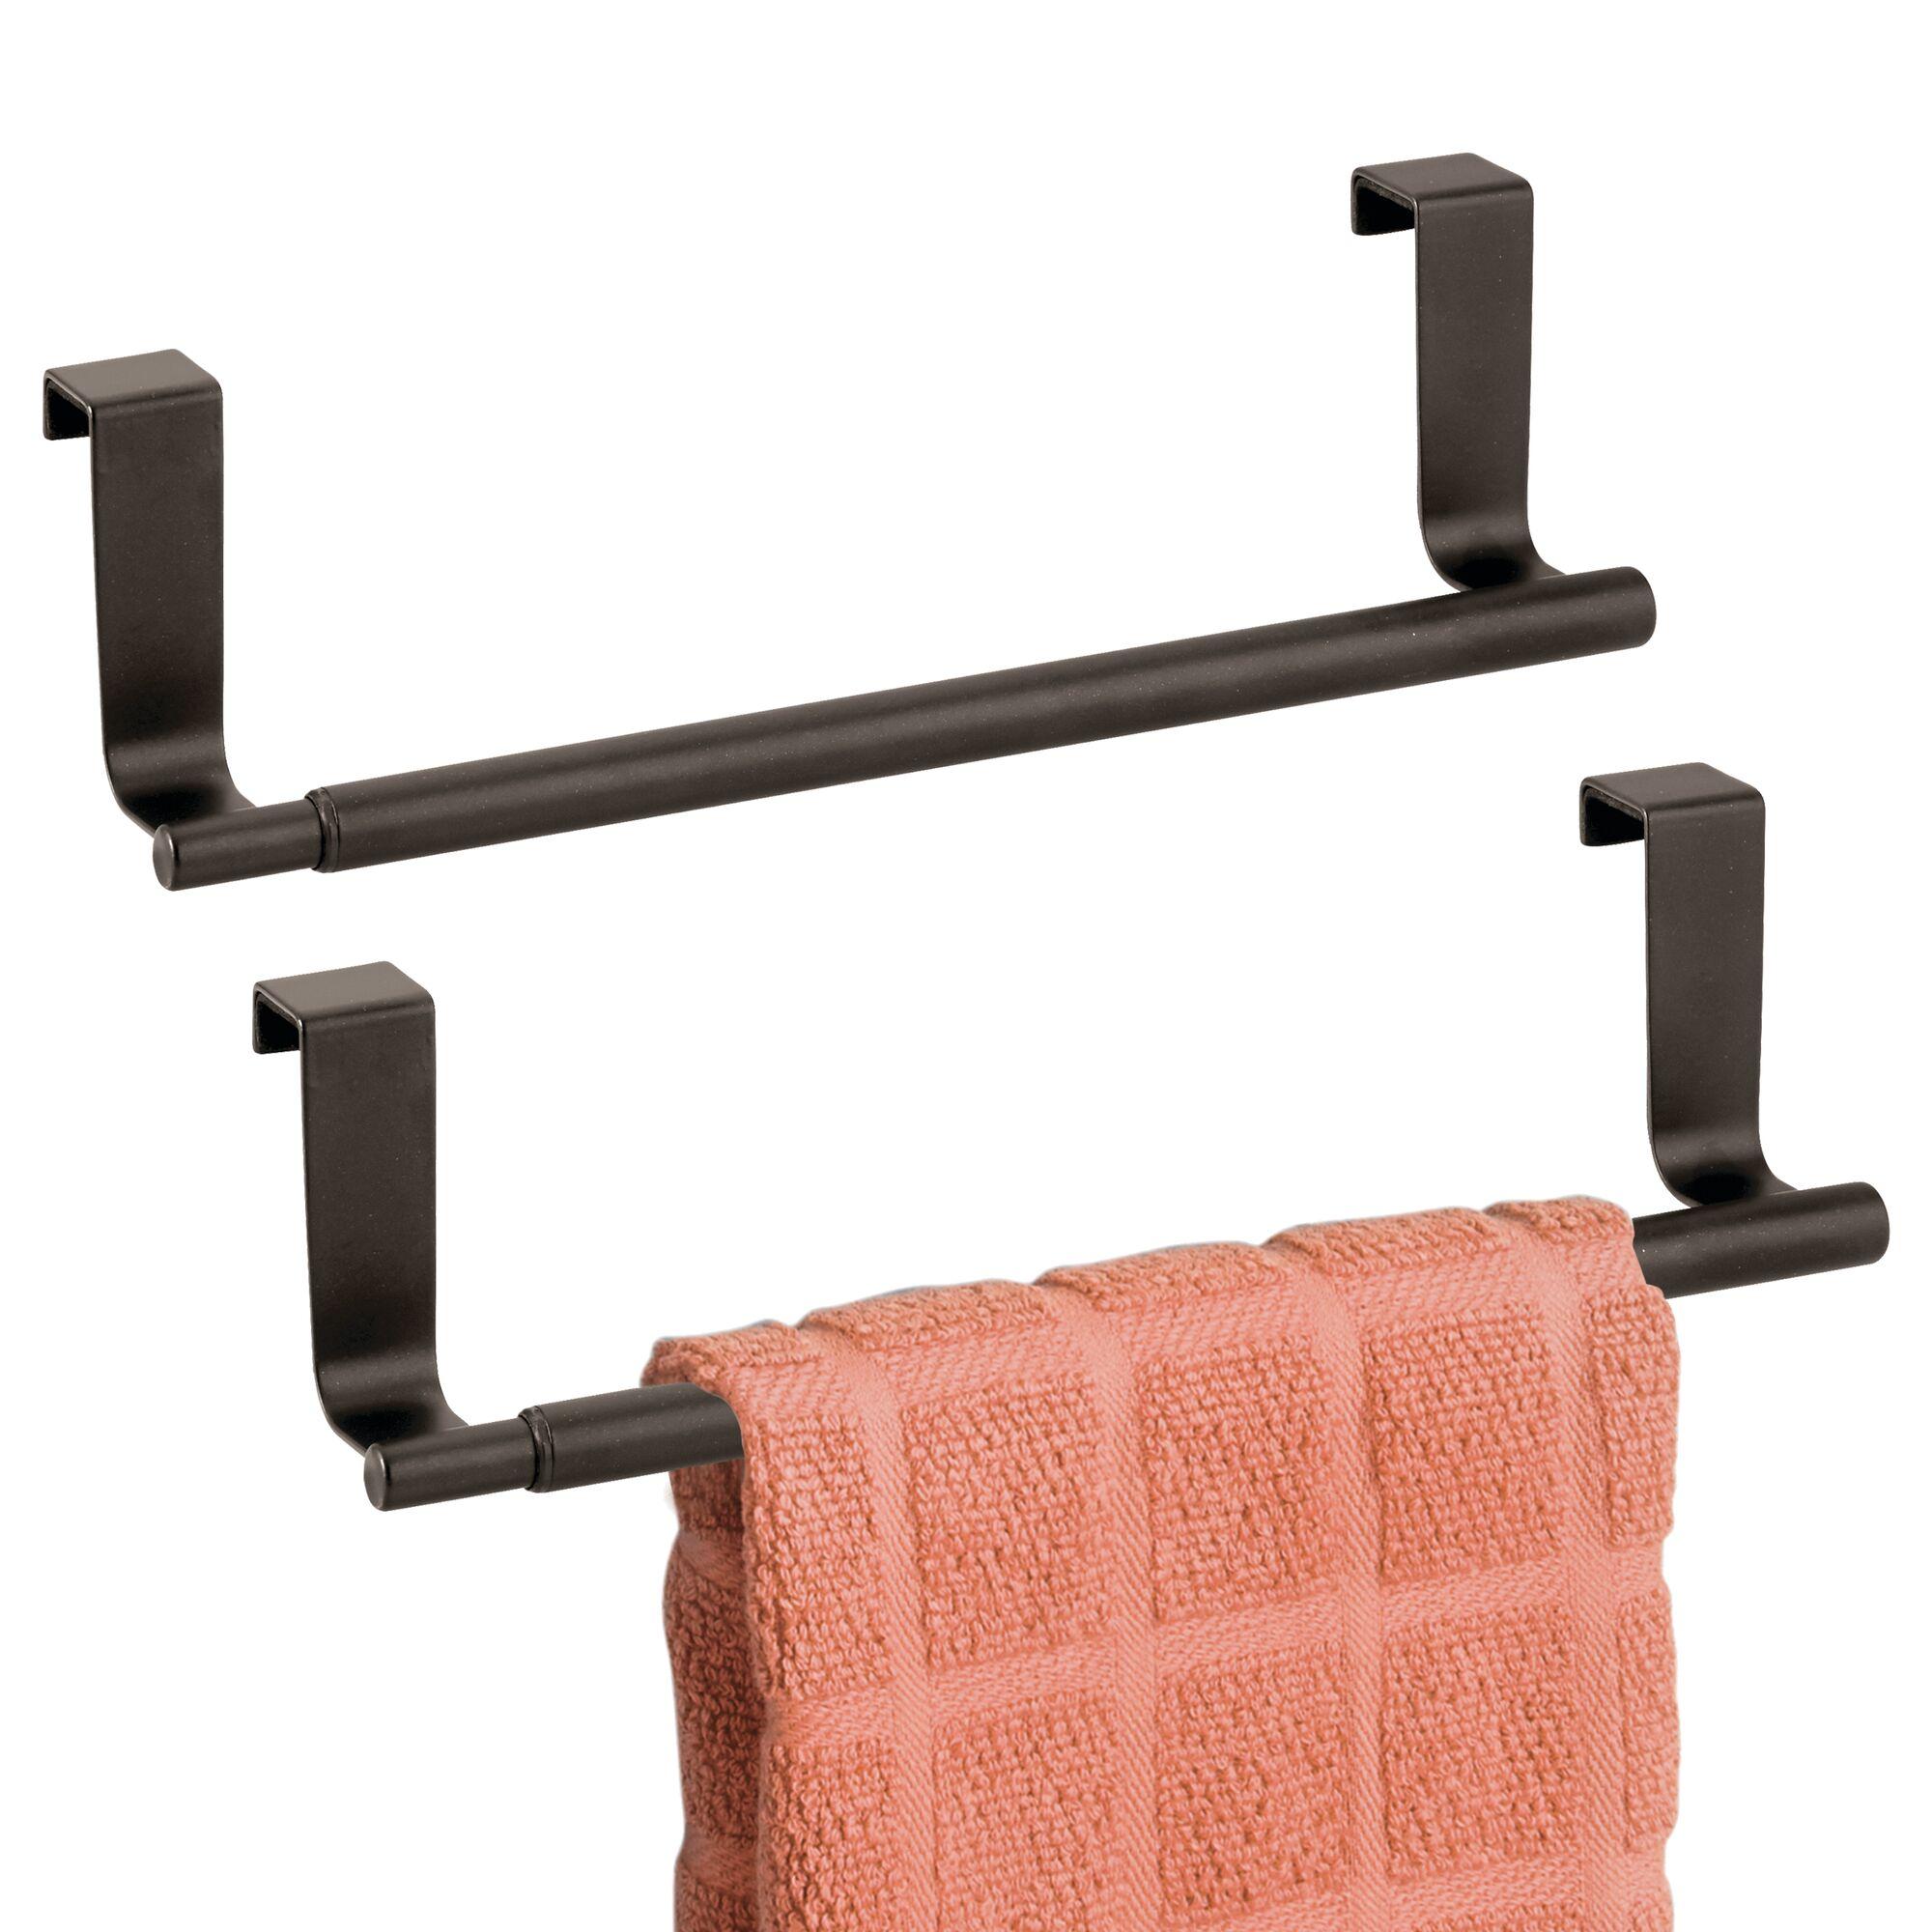 Mdesign Expandable Kitchen Over Cabinet Towel Bar Rack 2 Pack